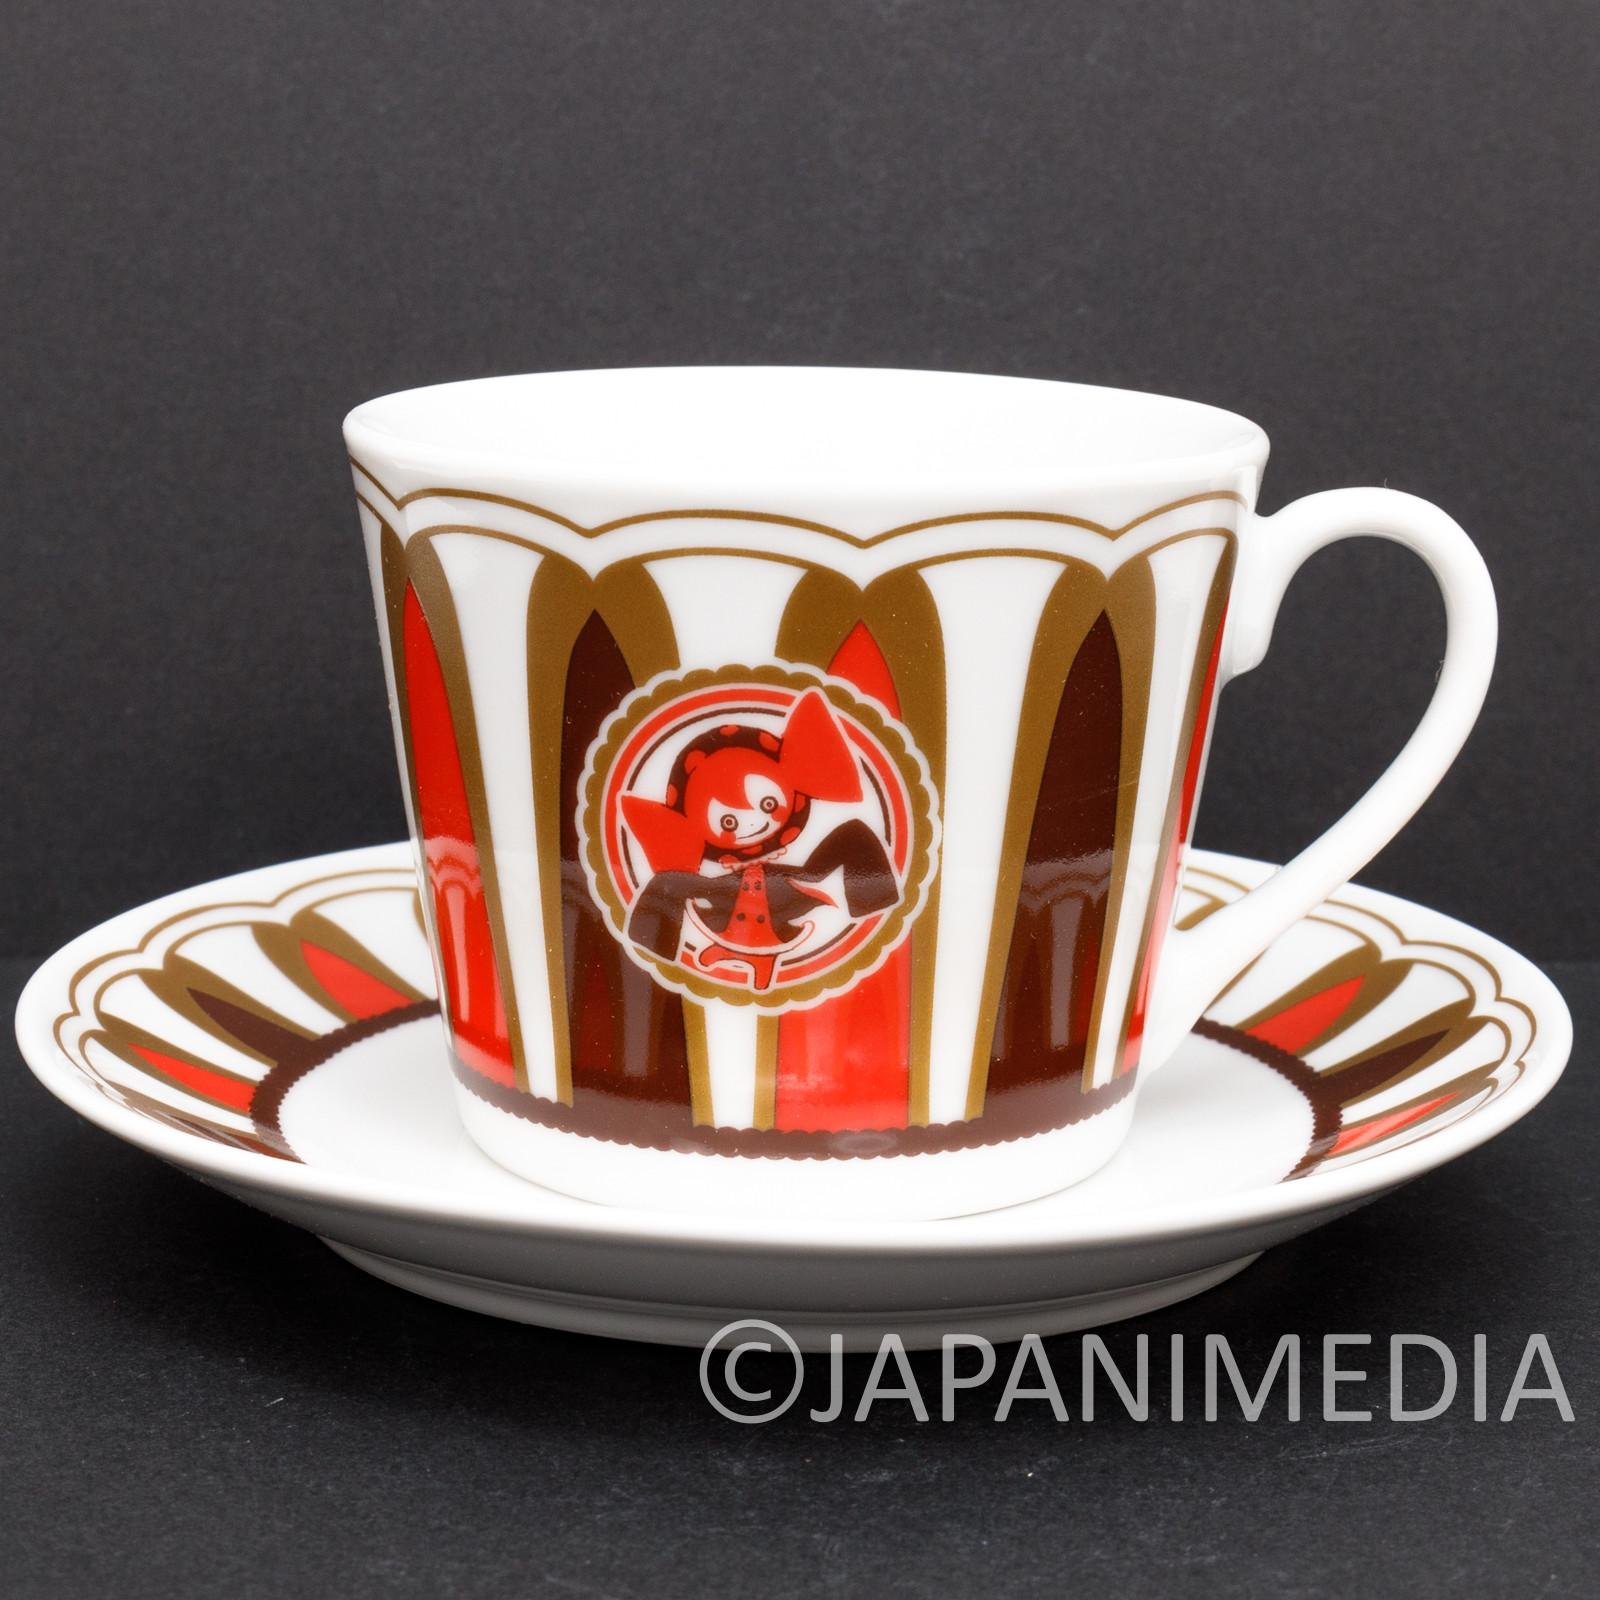 Puella Magi Madoka Magica Sweet Witch Charlotte Bebe Tea cup & Saucer JAPAN